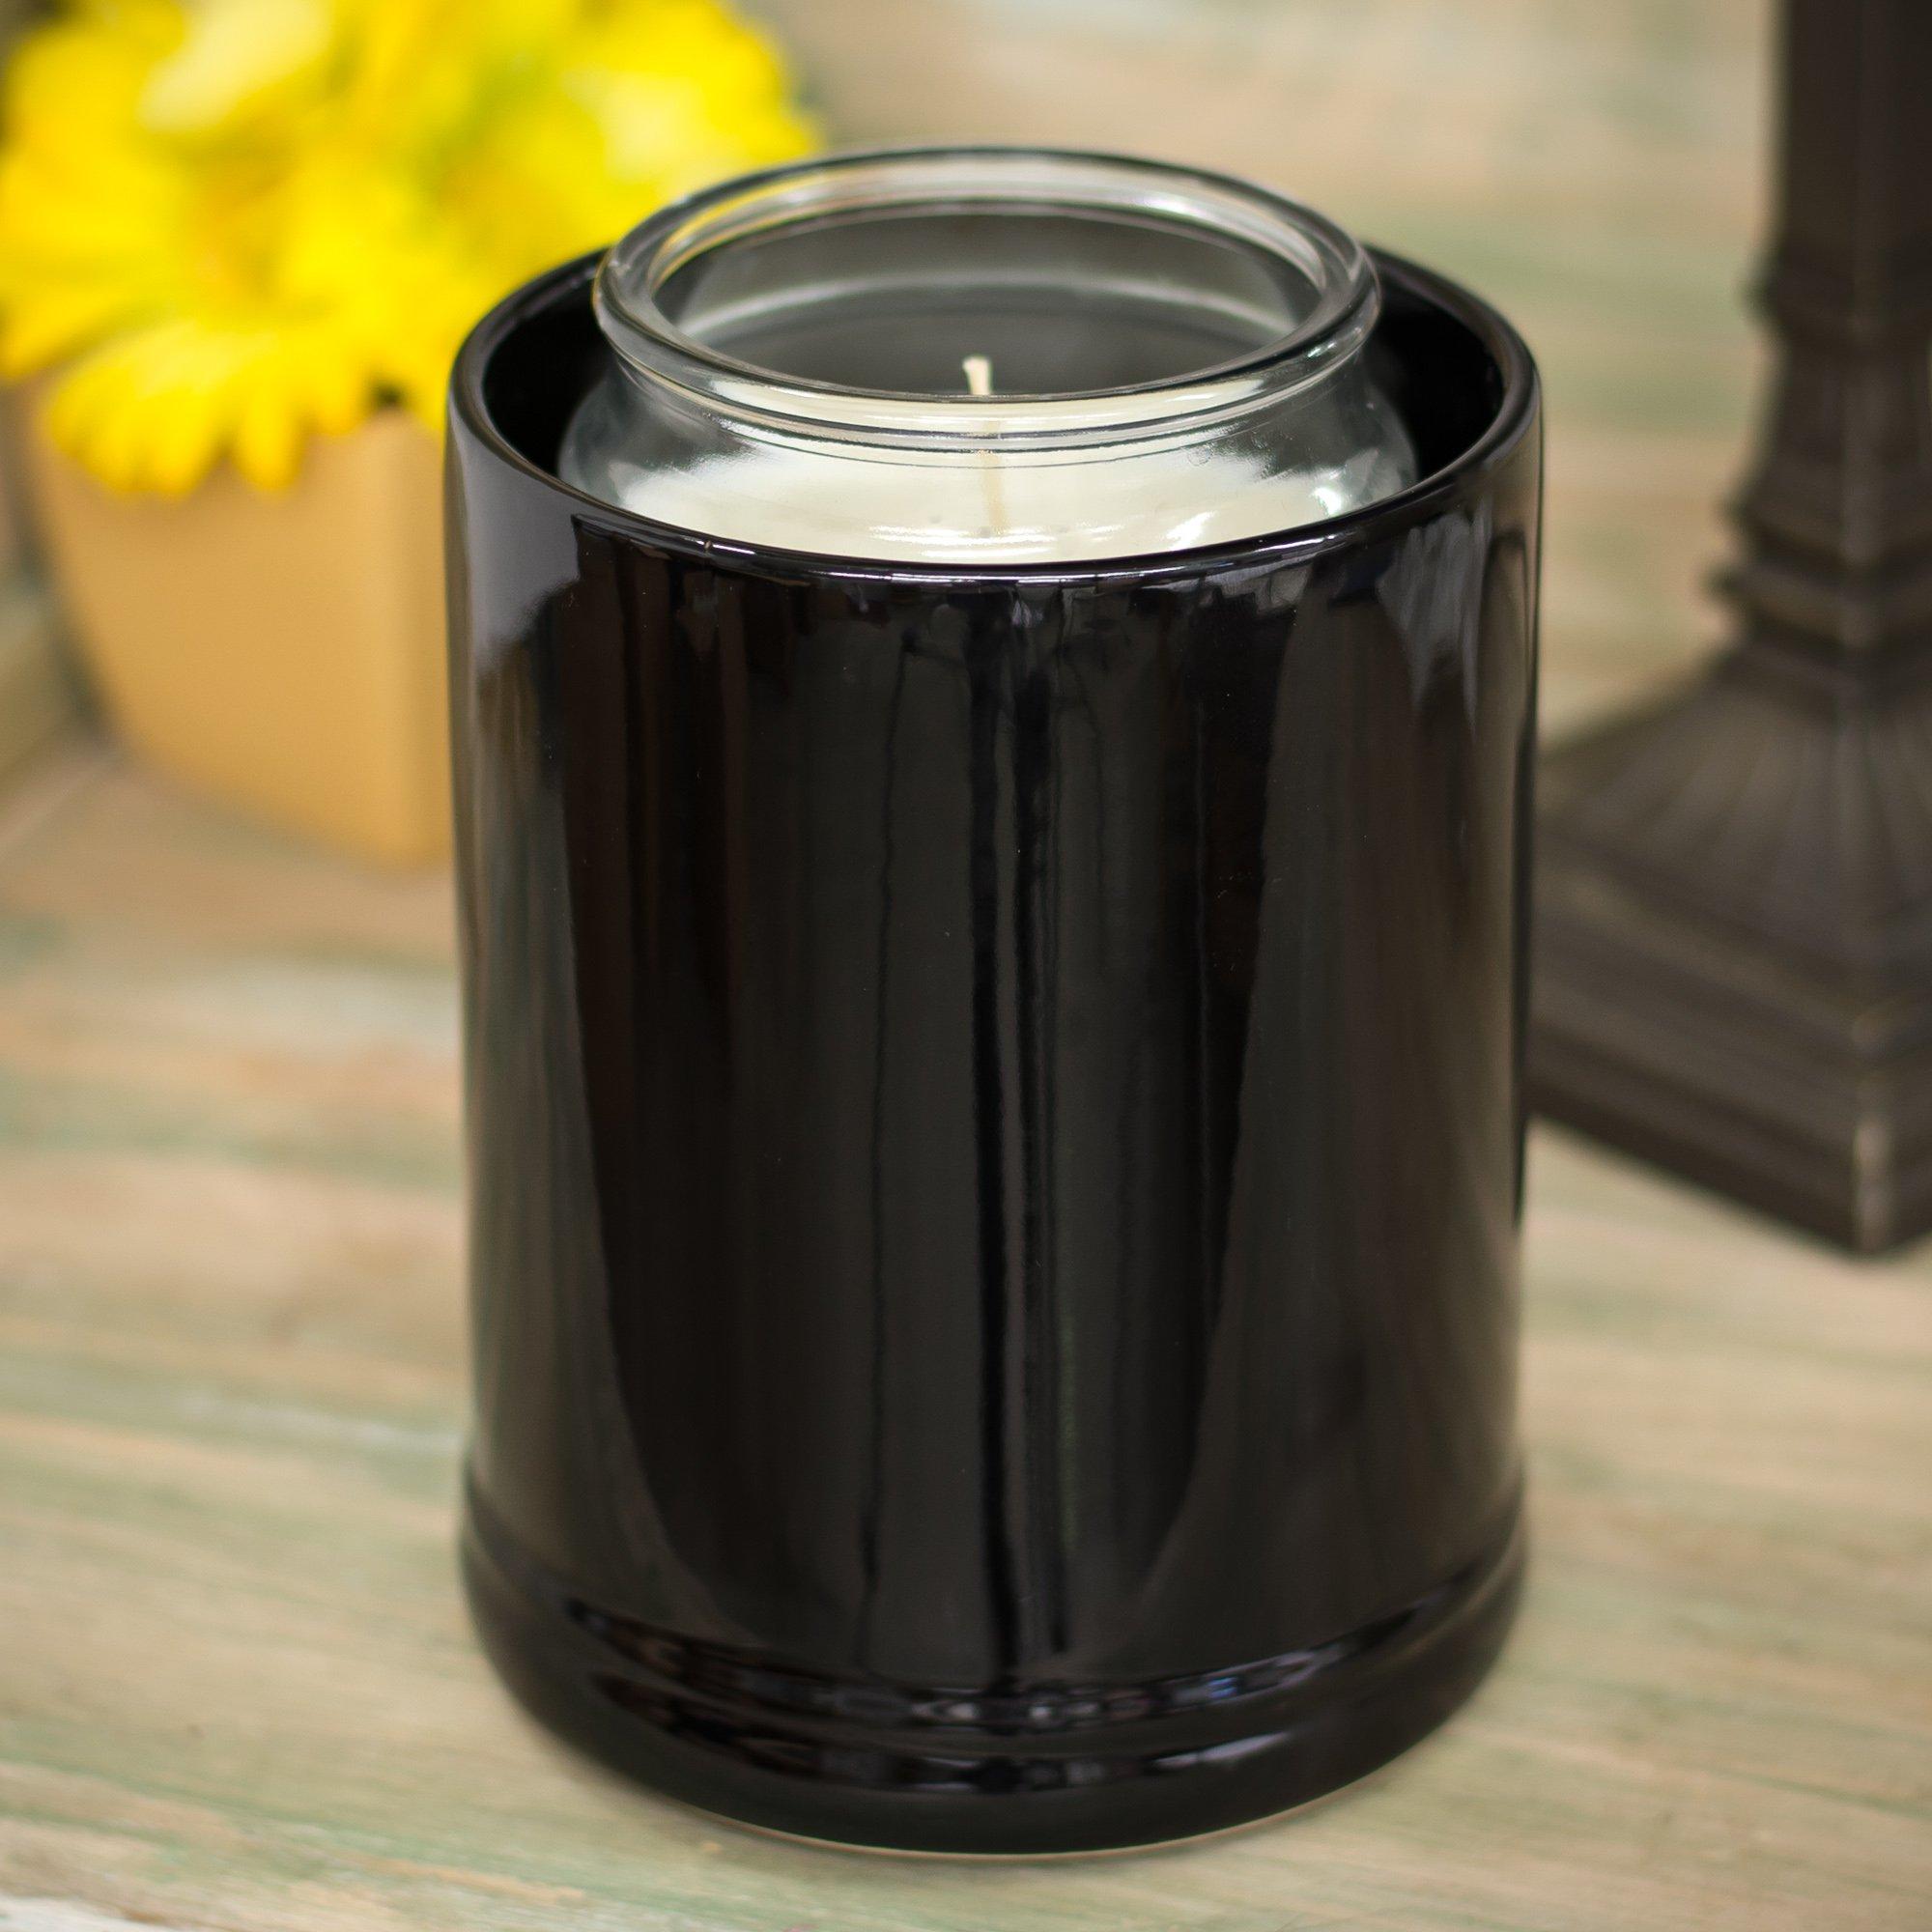 Elanze Designs Glossy Black Ceramic Stoneware Jar Candle Warmer, 2 Pack by Elanze Designs (Image #2)